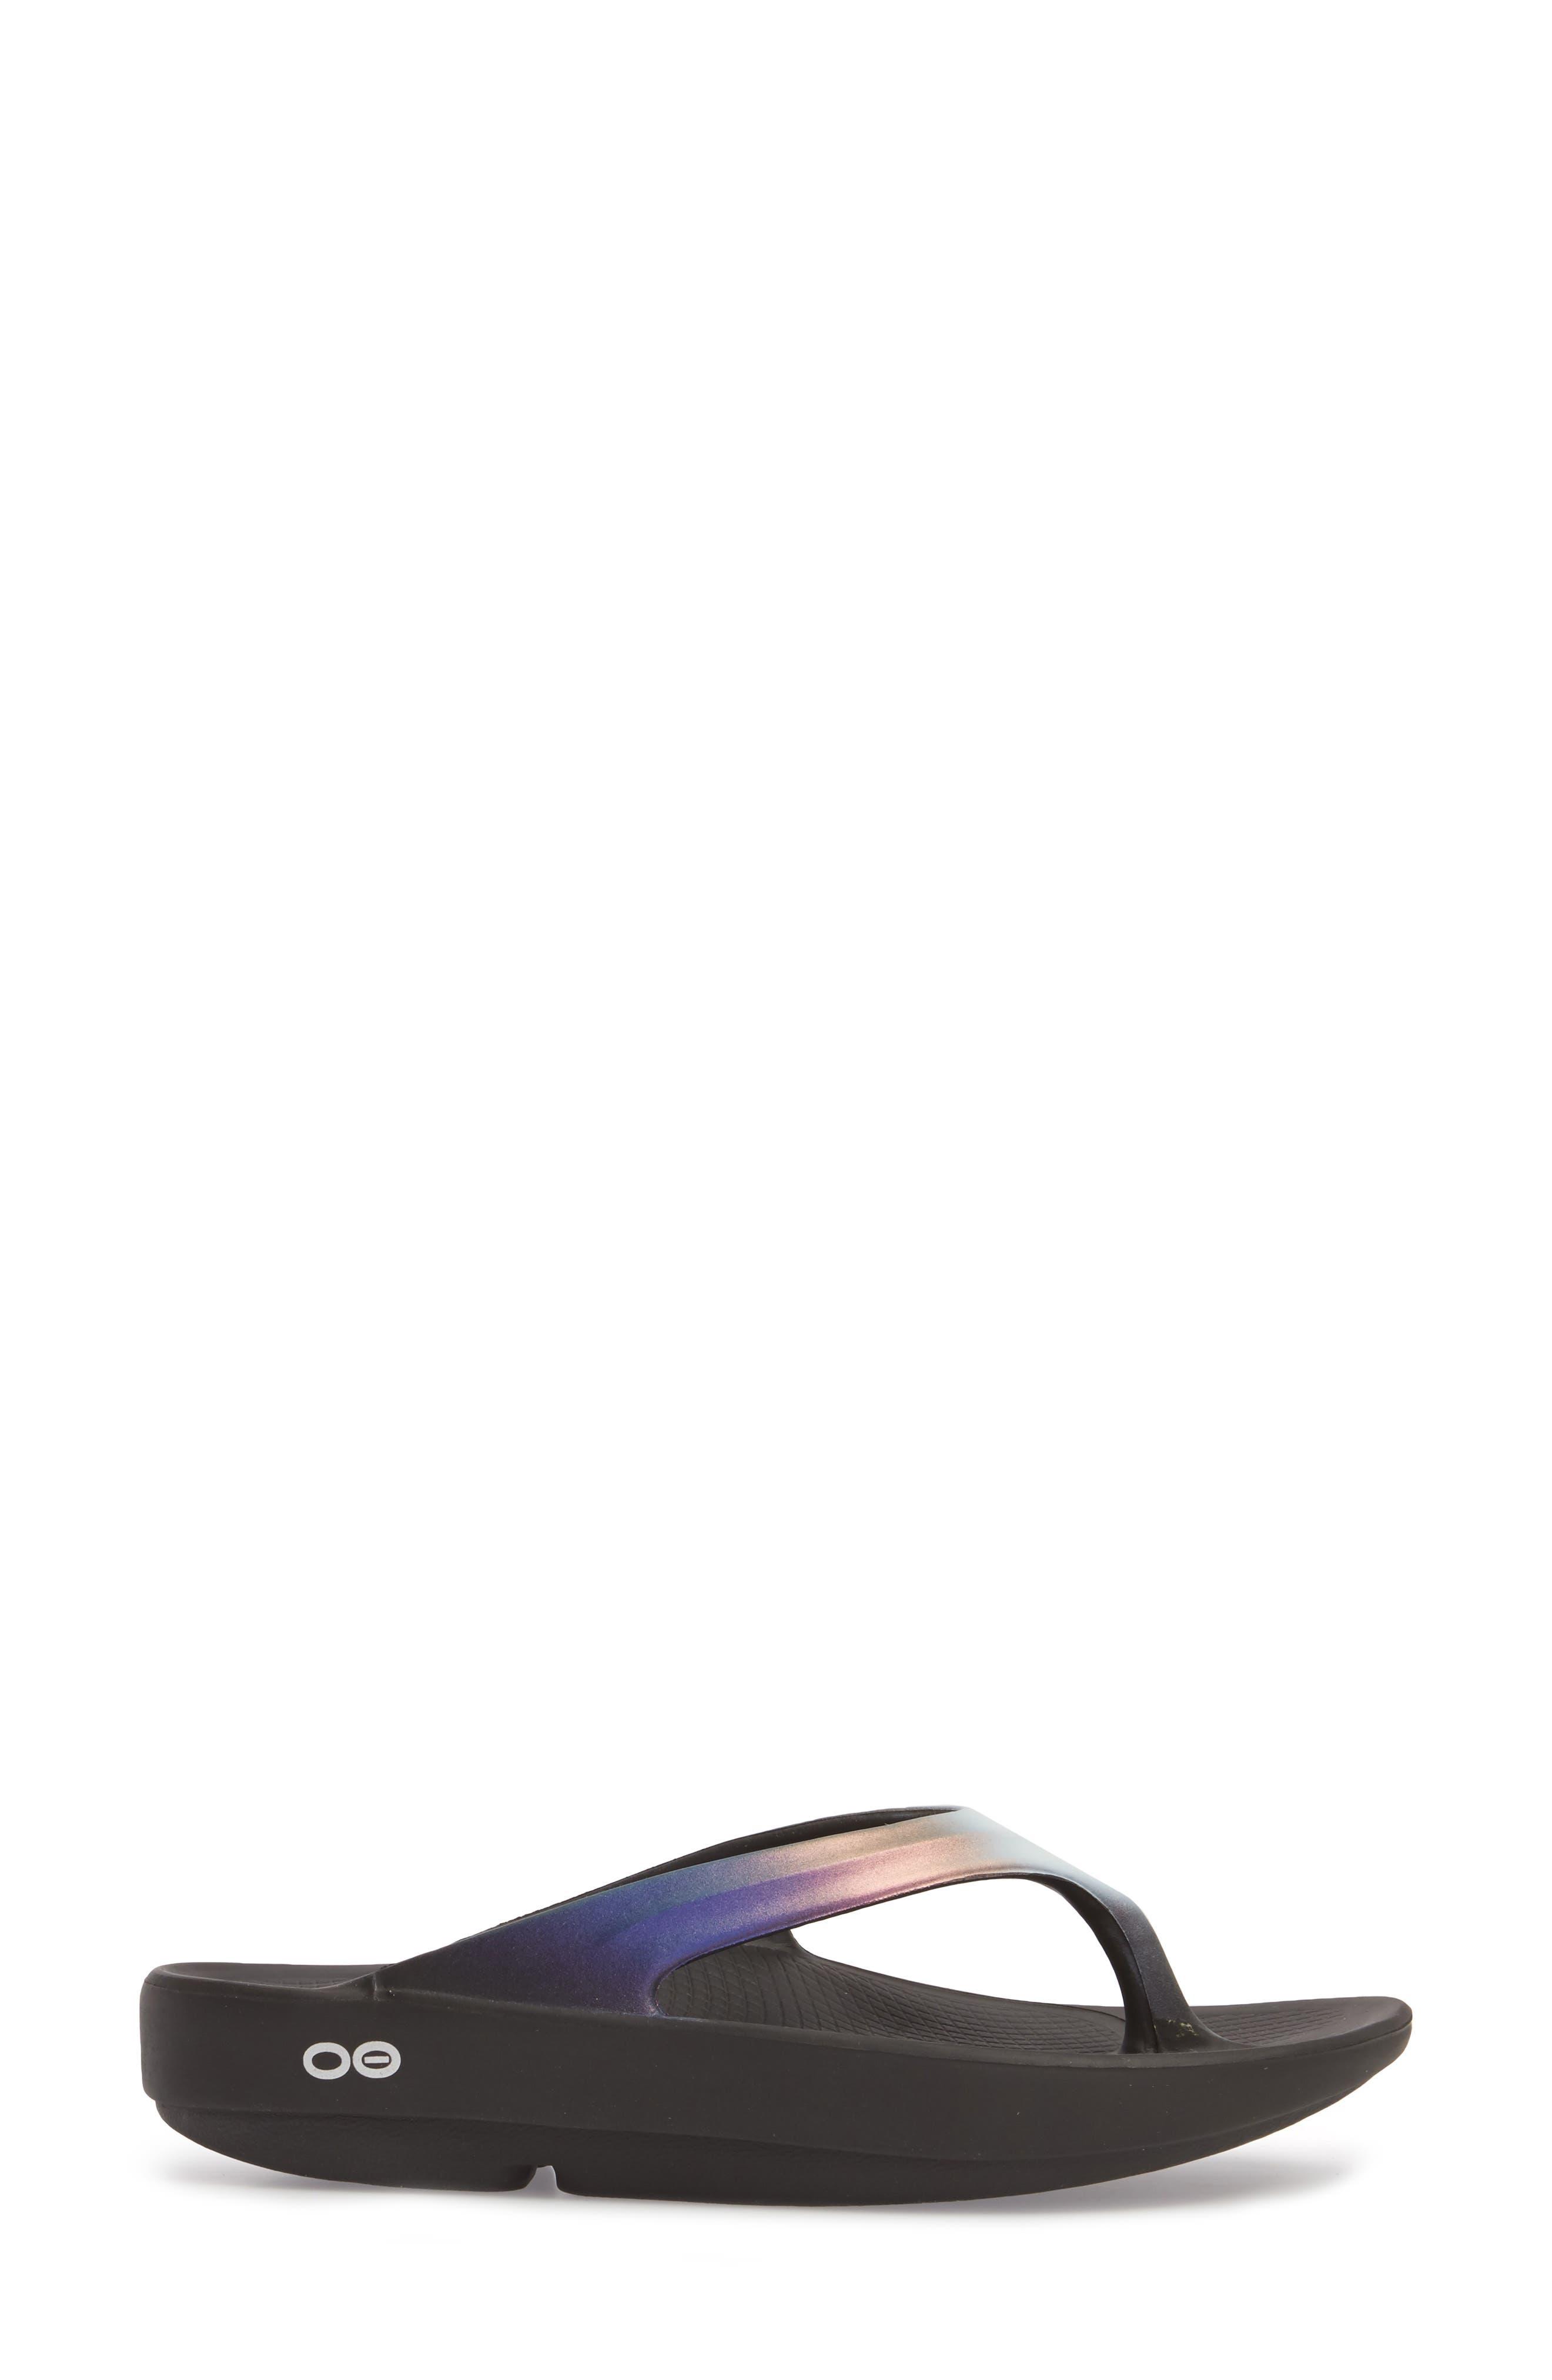 OOlala Luxe Sandal,                             Alternate thumbnail 6, color,